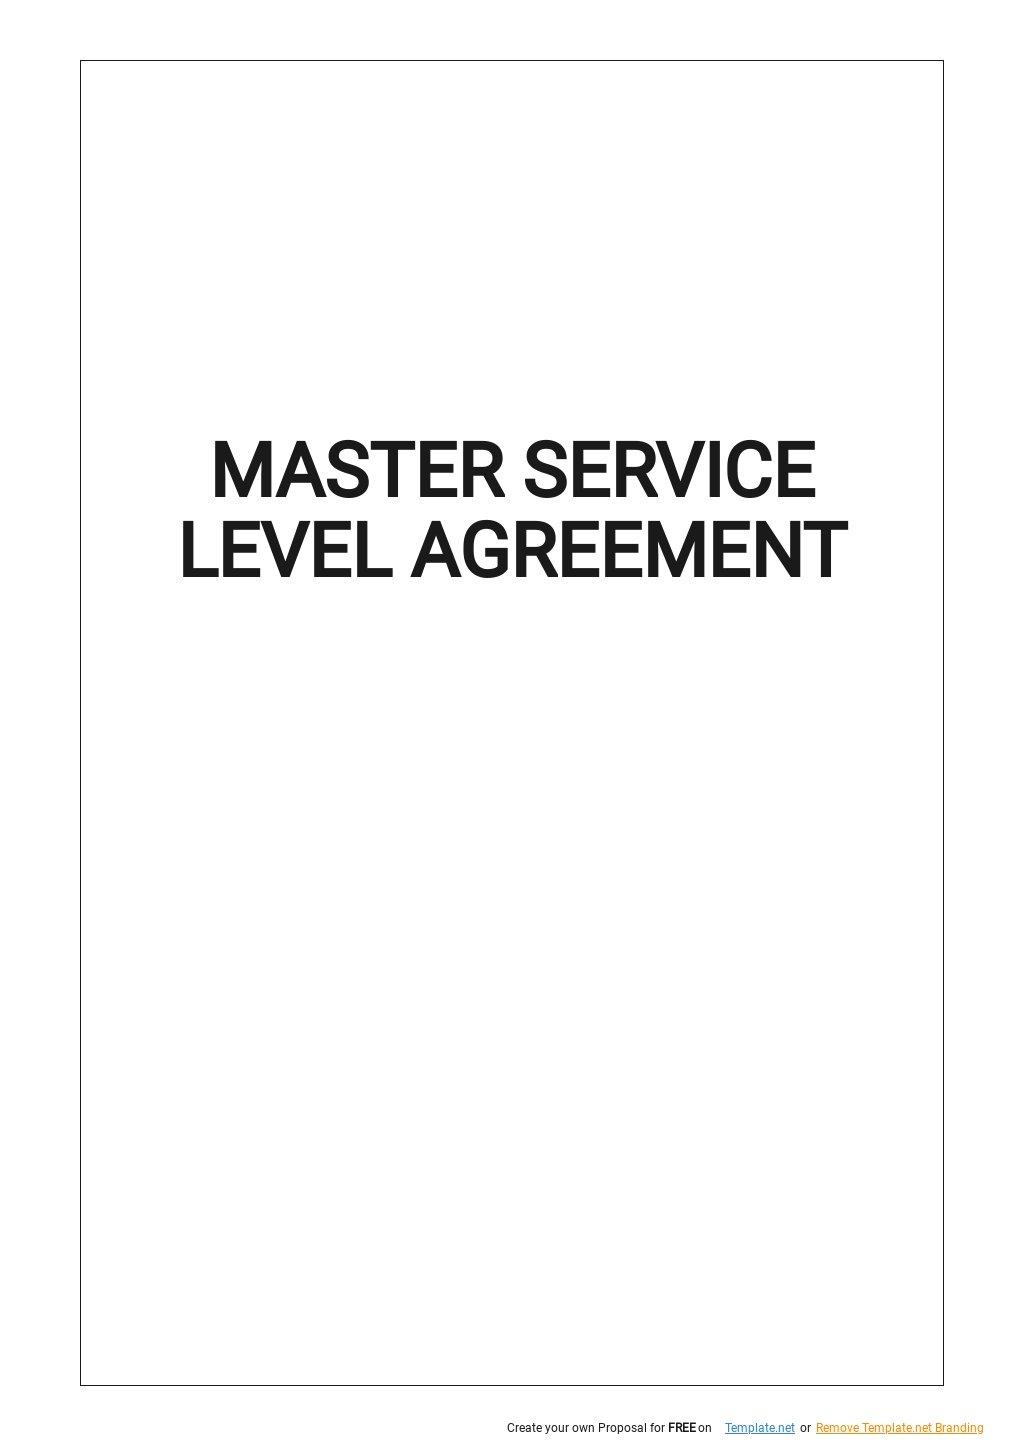 Master Service Level Agreement Template .jpe